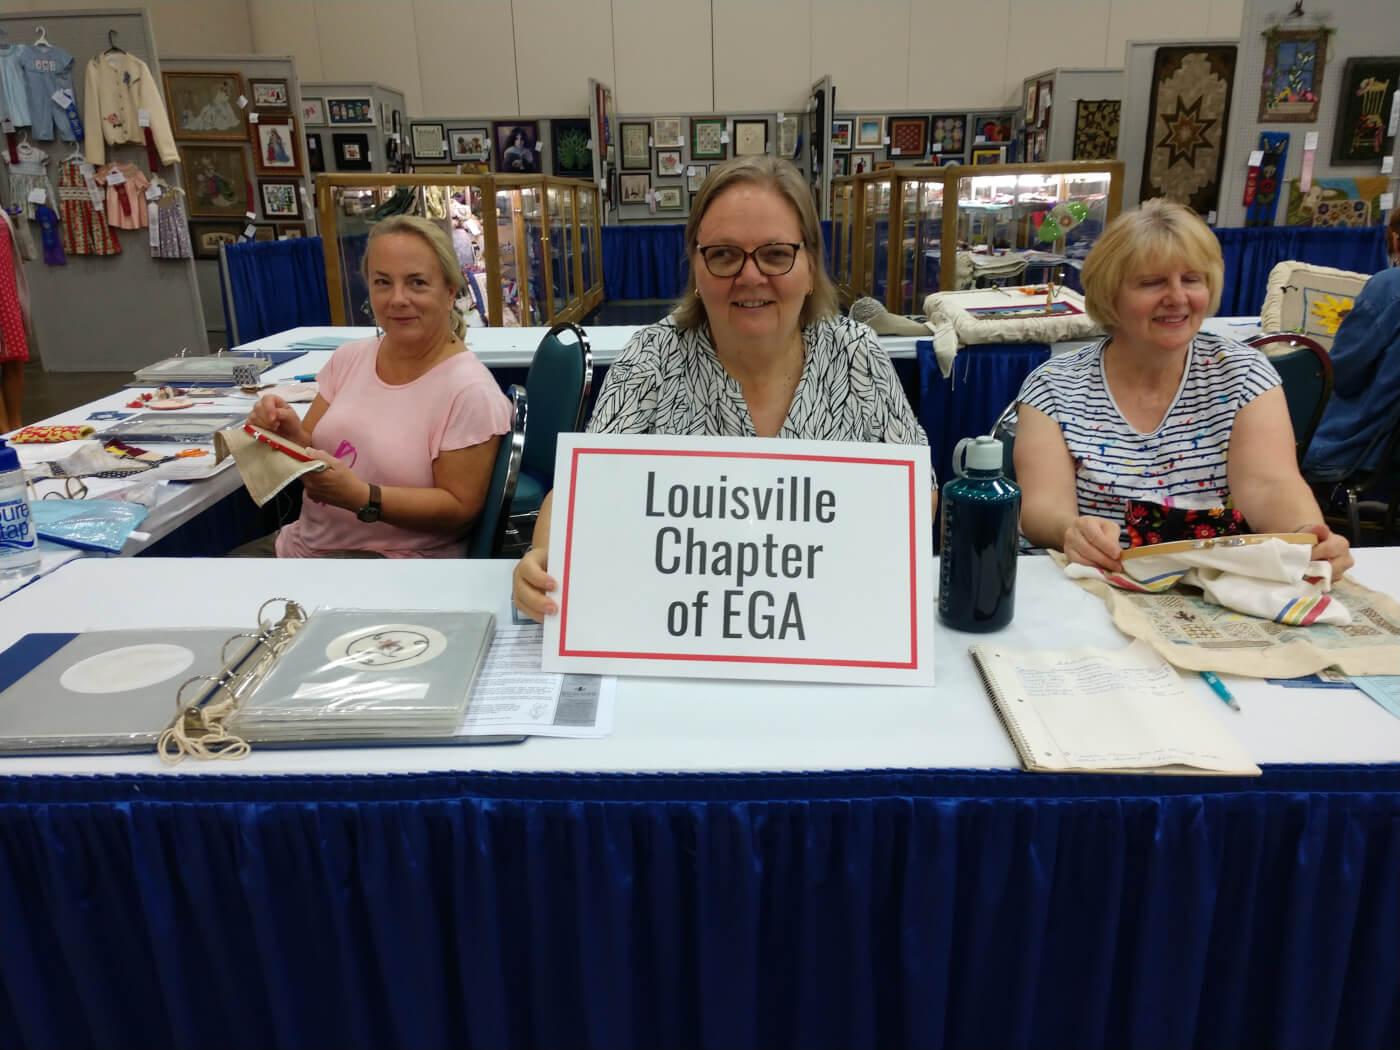 Louisville Chapter